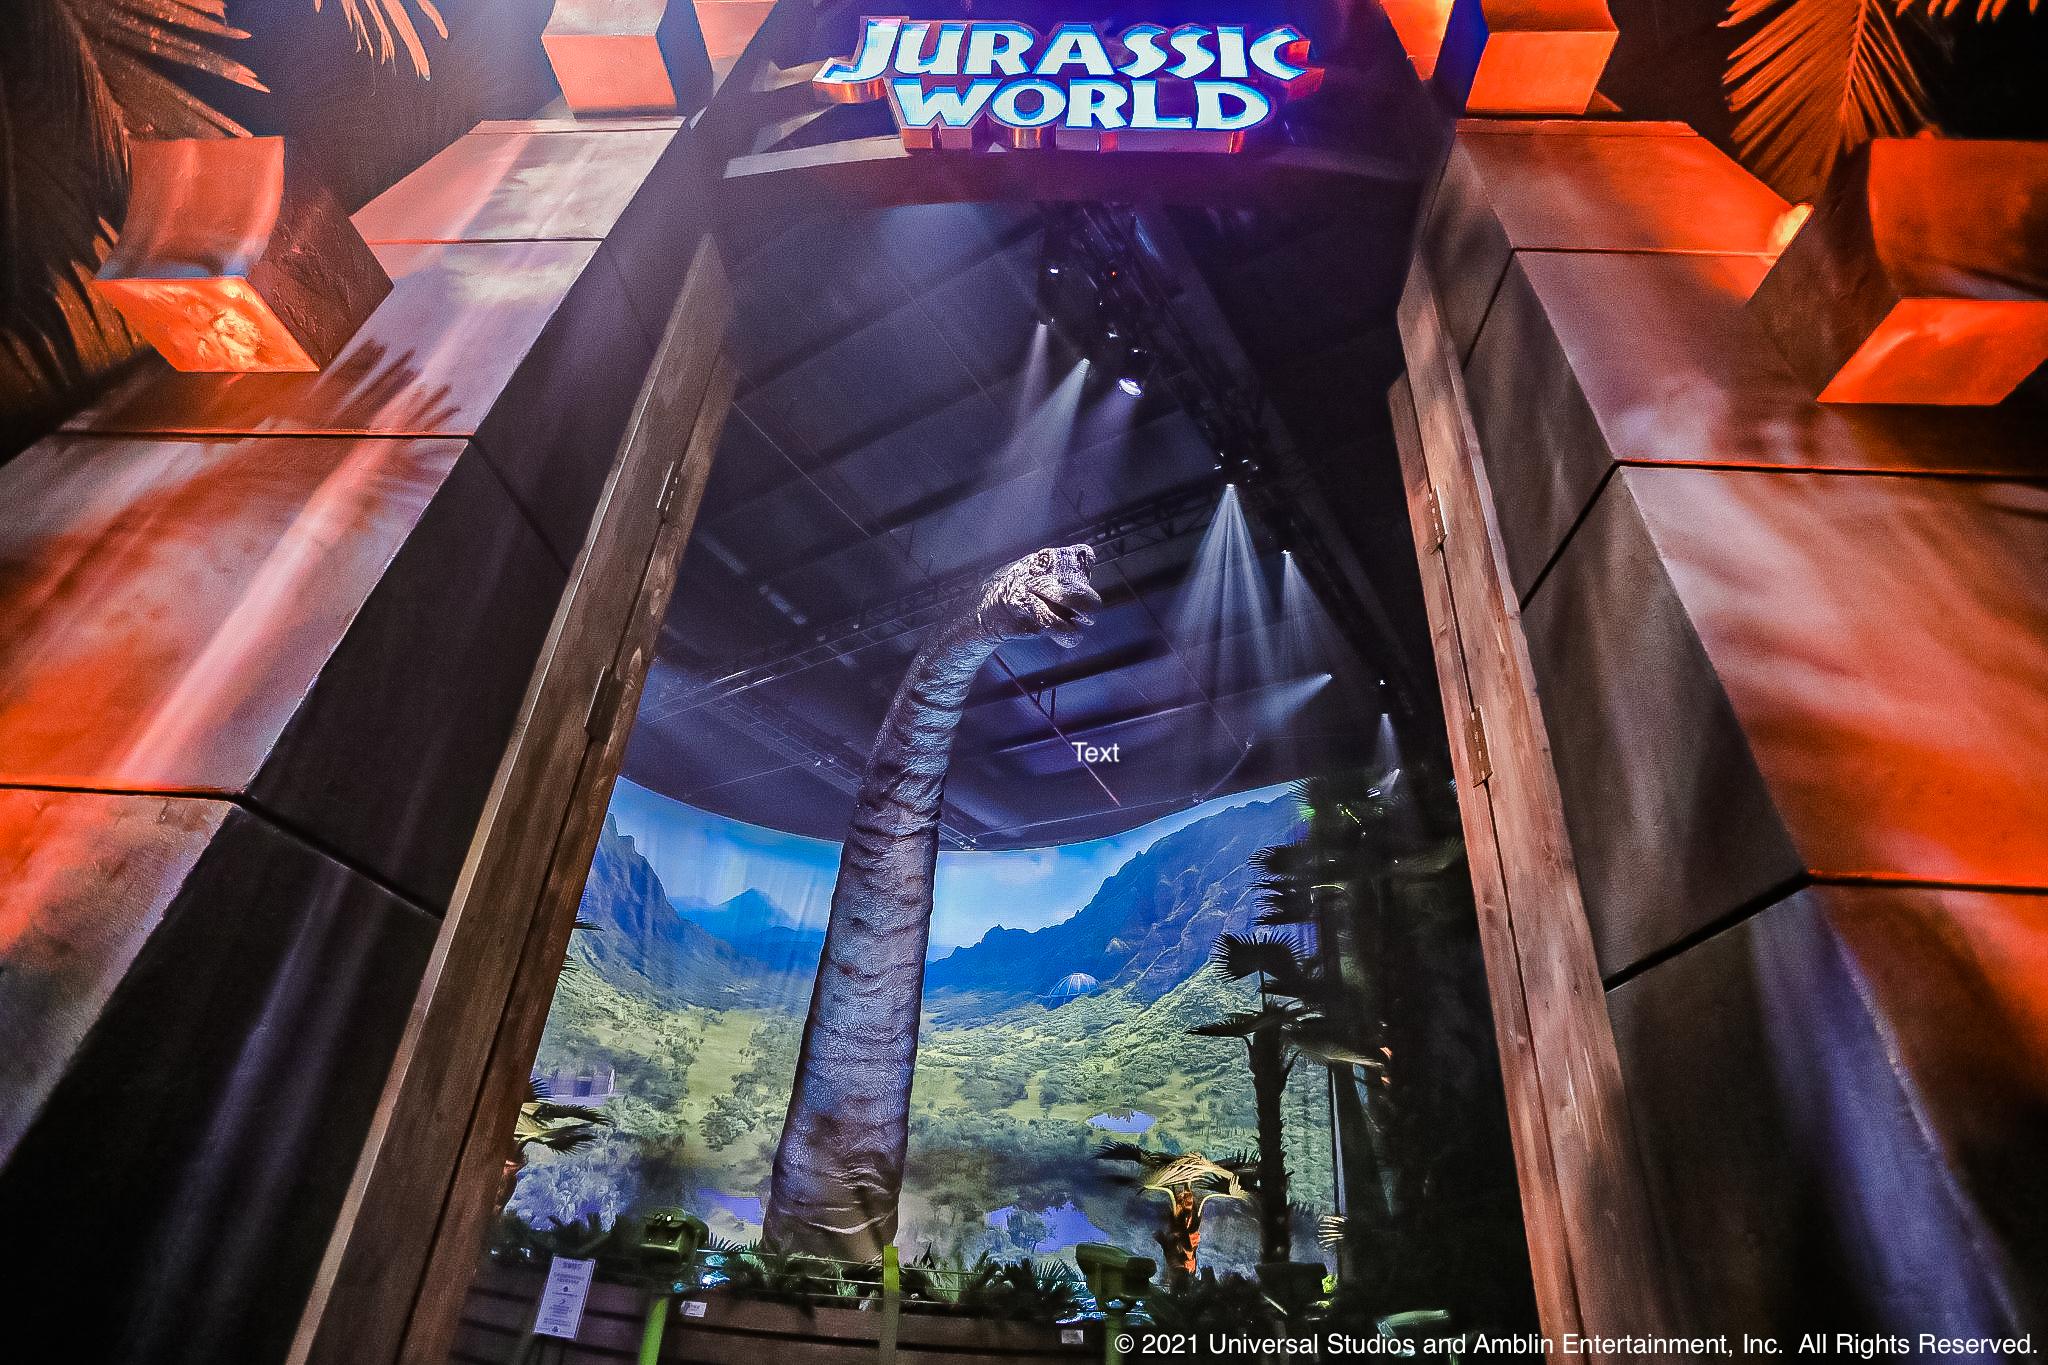 JURASSIC WORLD: THE EXHIBITION